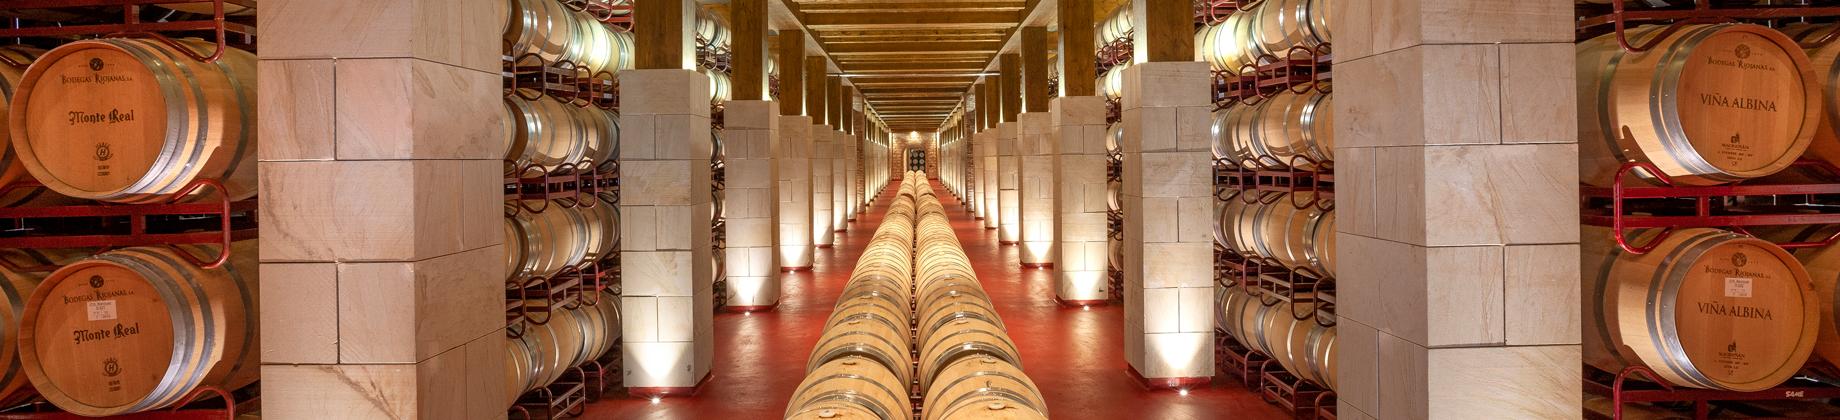 Visita a Bodegas Riojanas